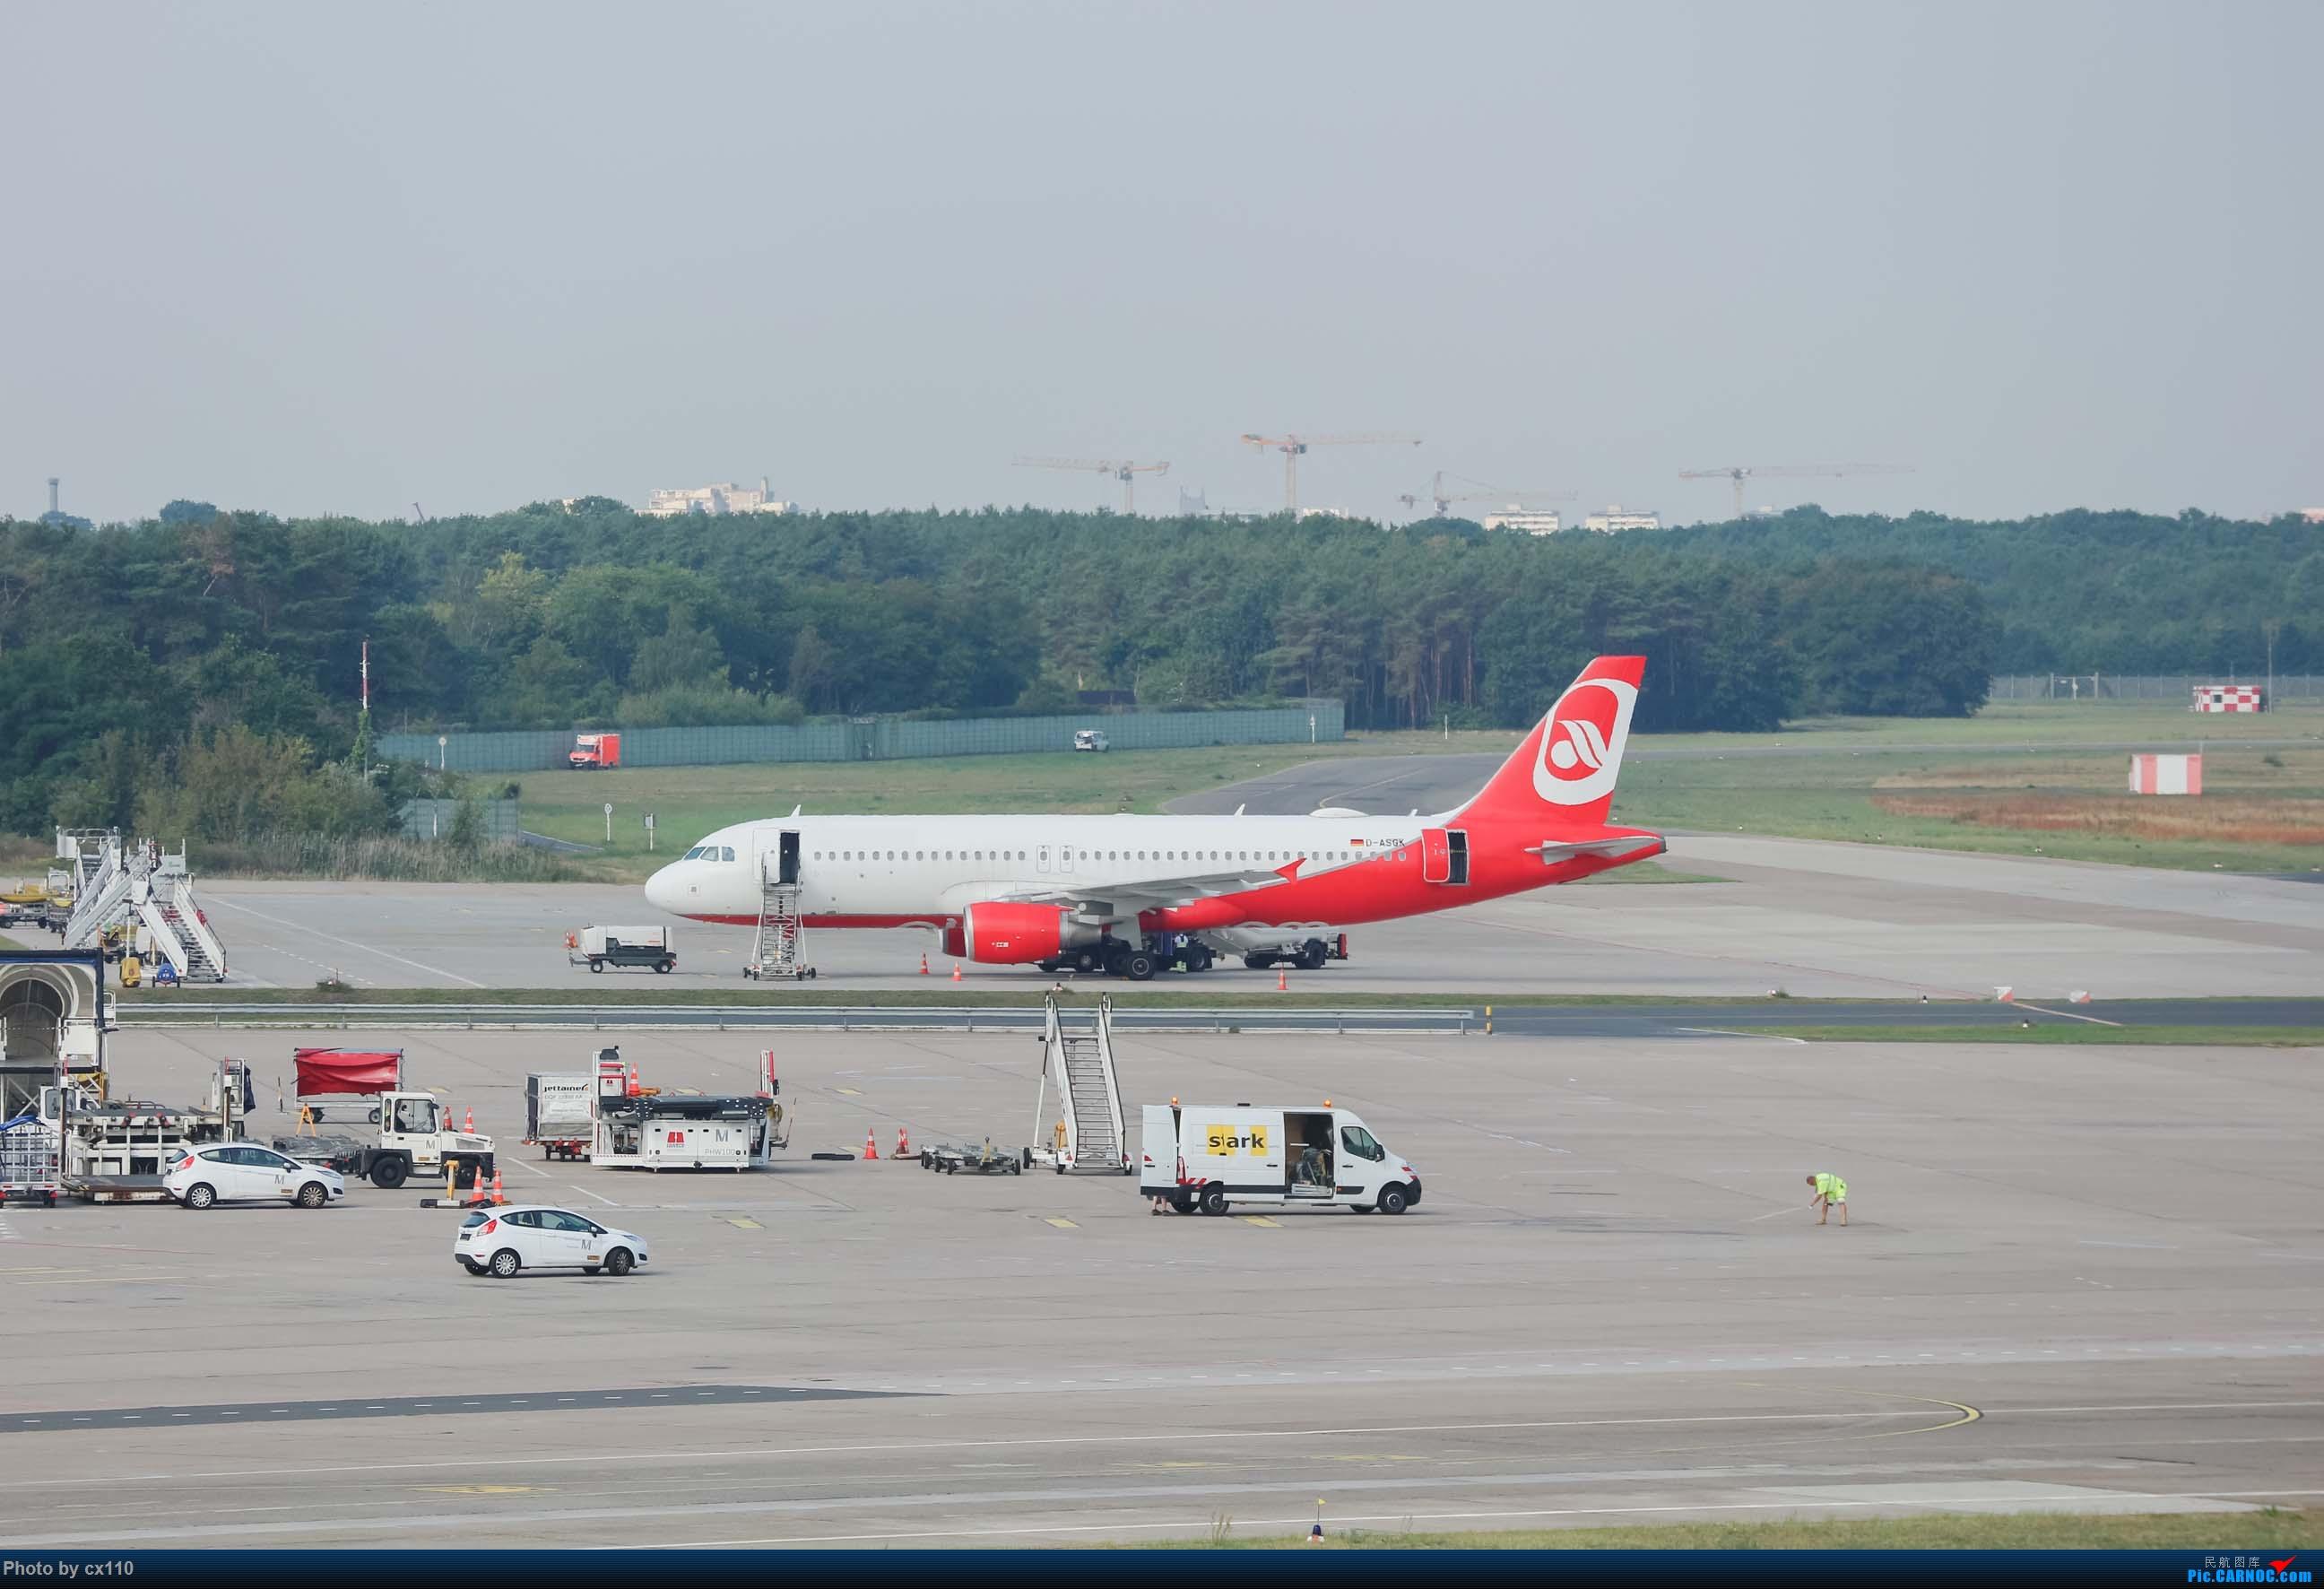 Re:[原创]欧洲机场拍机记-柏林/赫尔辛基/布拉格 AIRBUS A320-200 D-ASGK 德国柏林泰格尔机场